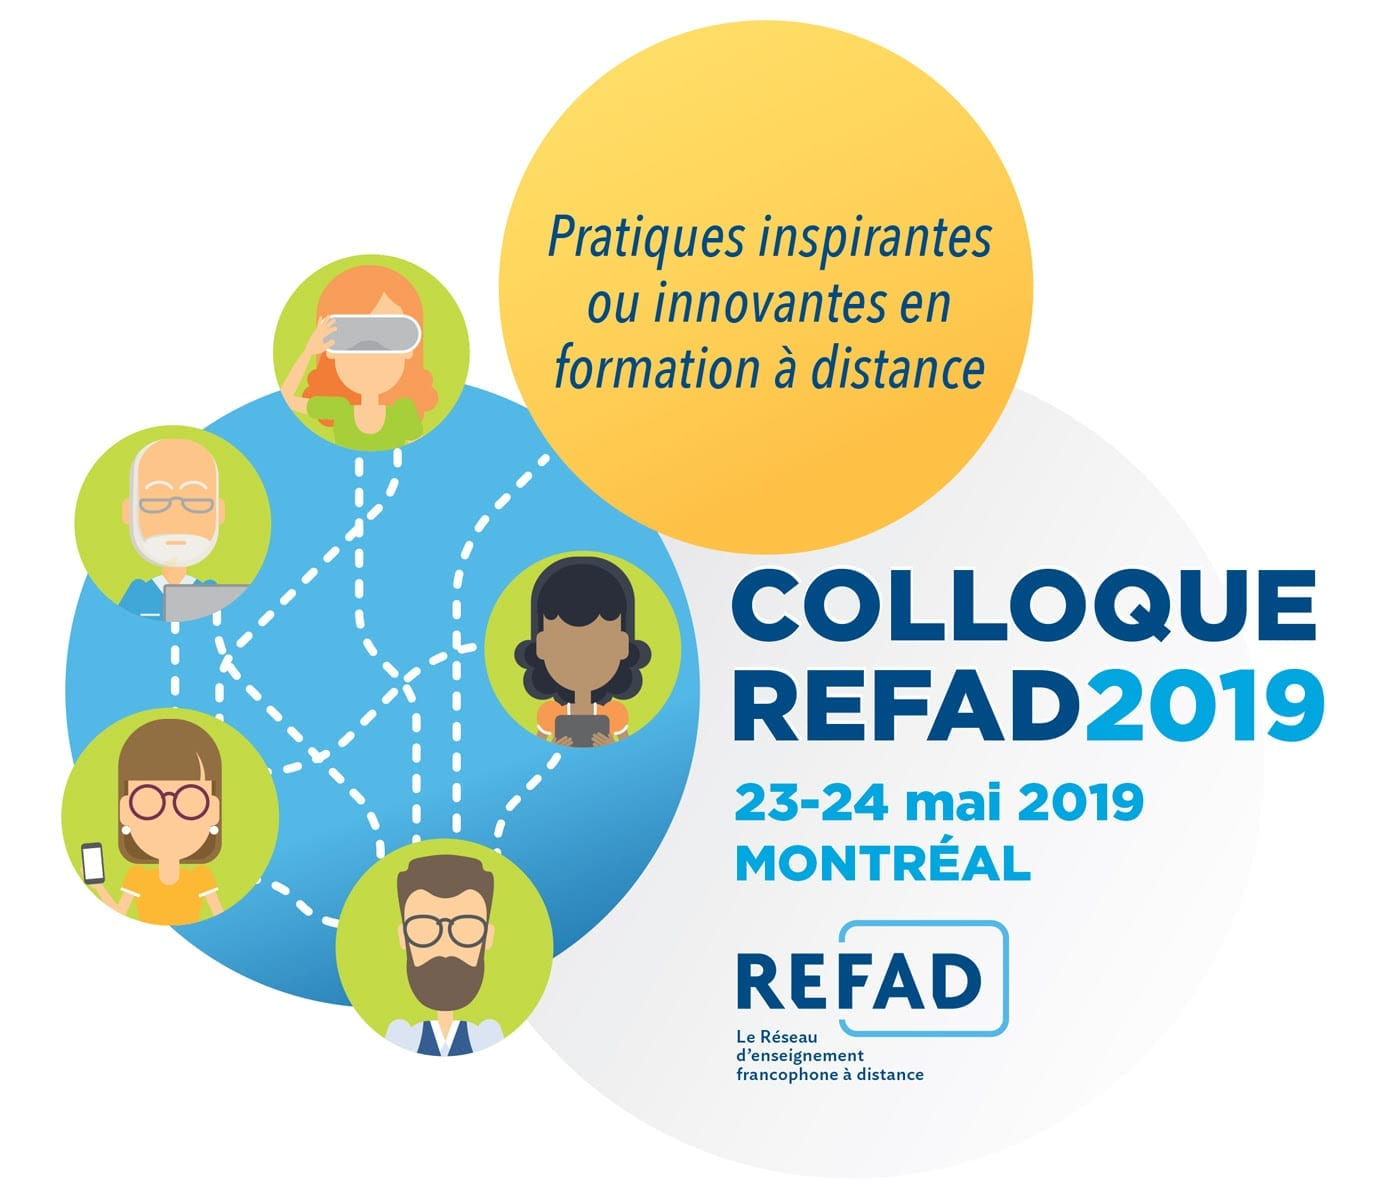 Colloque RÉFAD